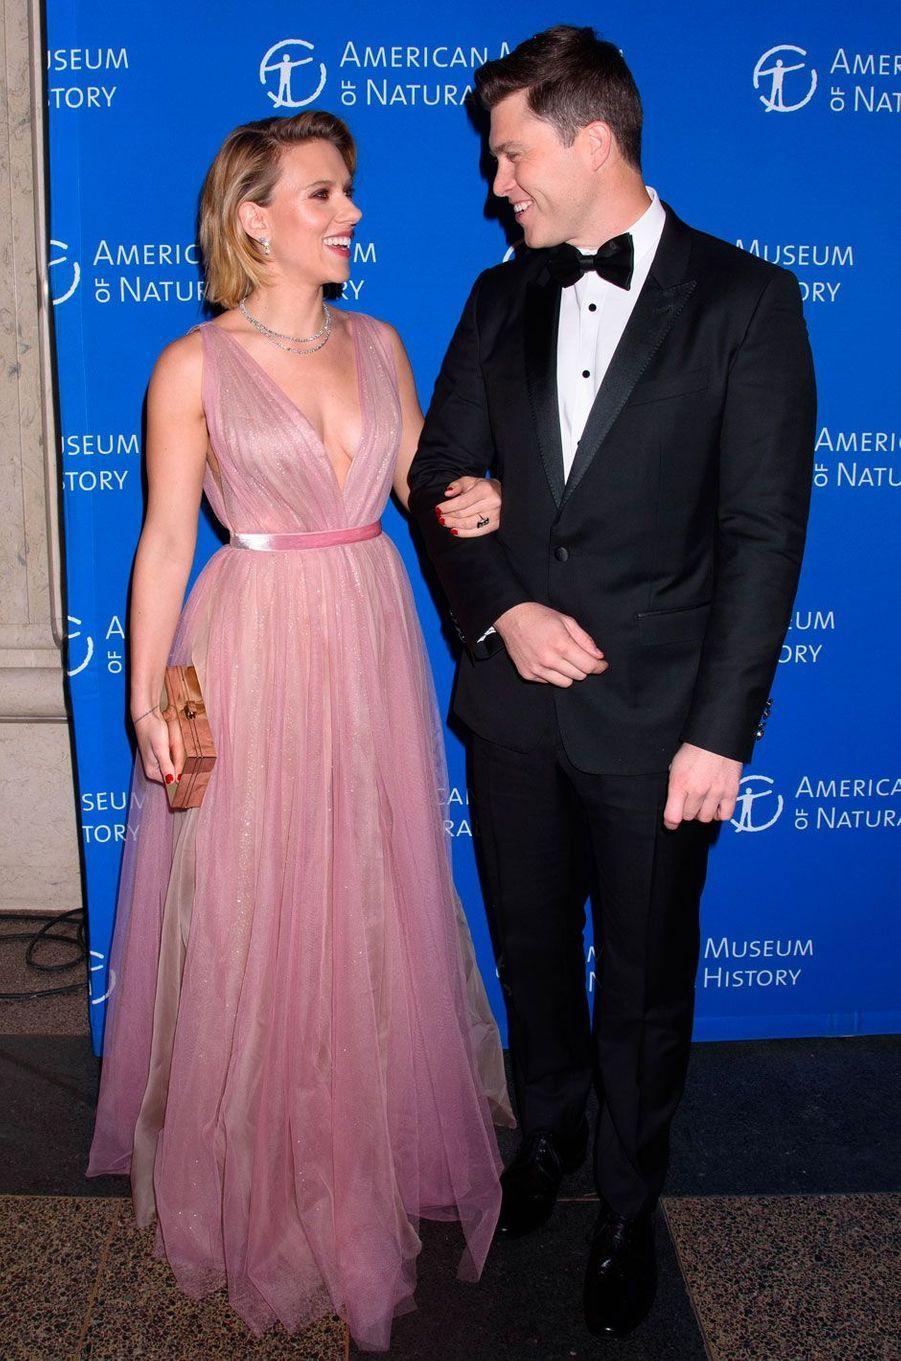 Scarlett Johansson et Colin Jost au gala de l'American Museum of Natural History le 15 novembre 2018